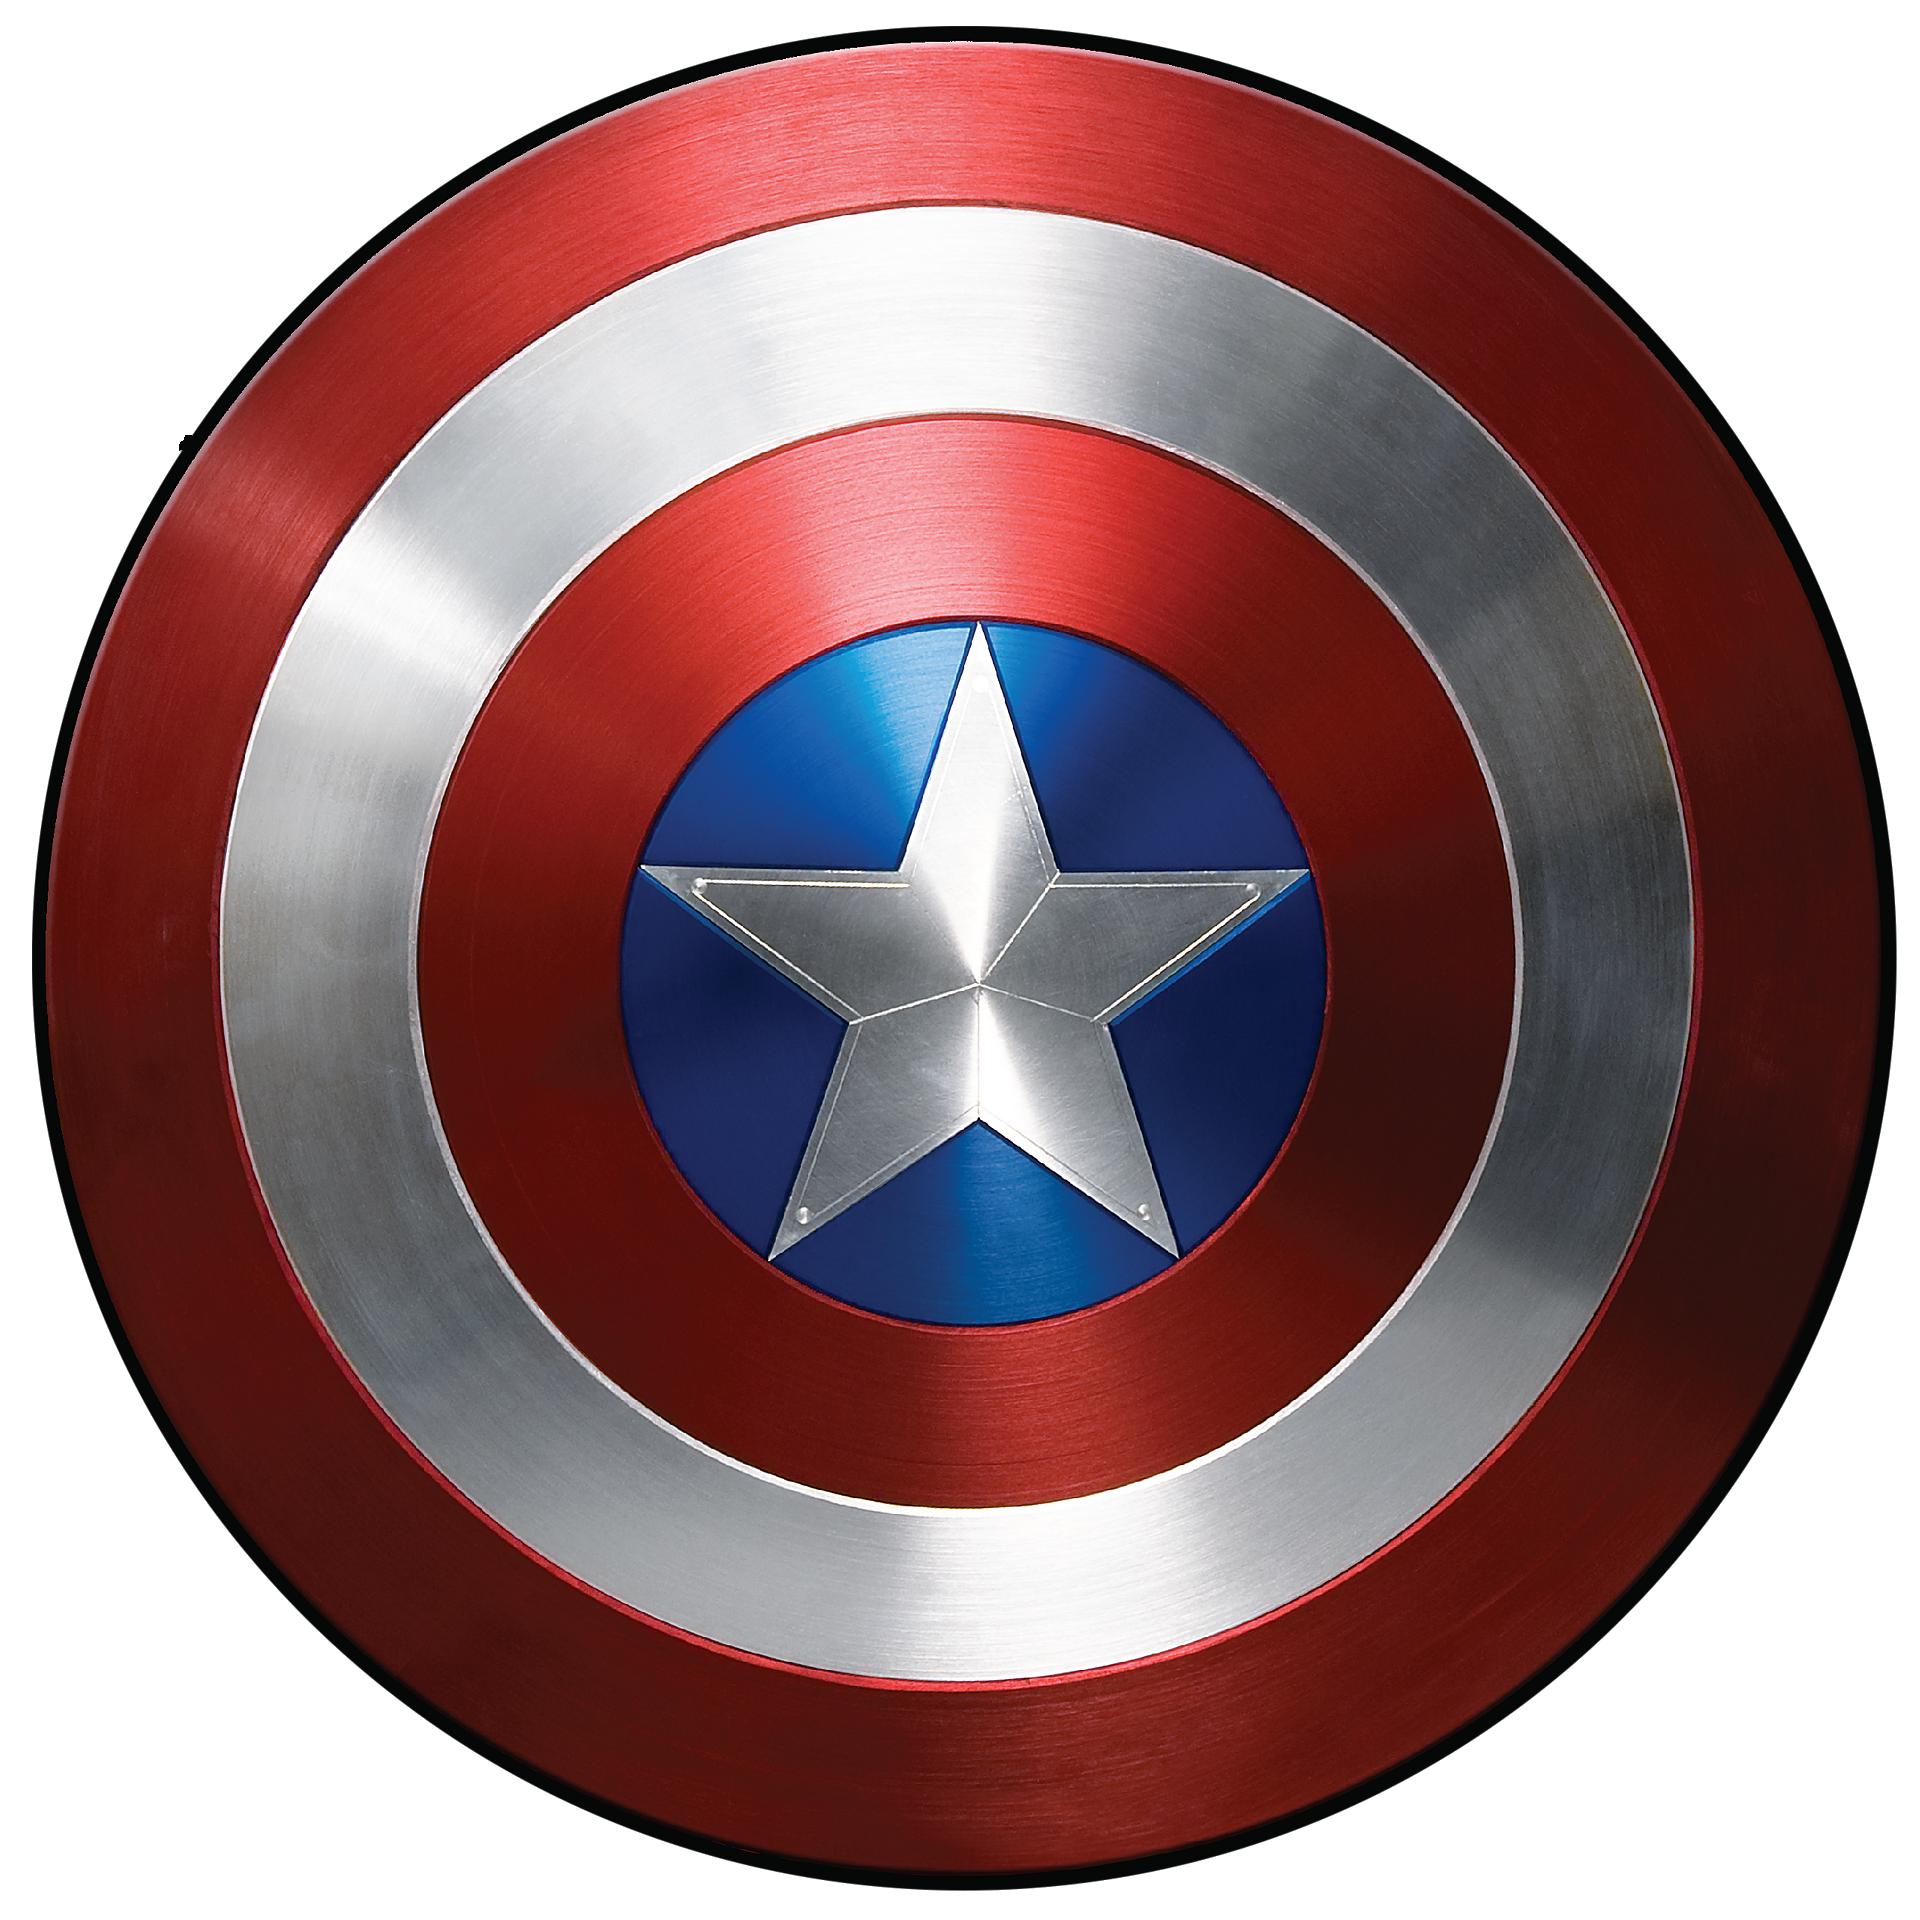 Captain America's Shield | Disney Wiki | FANDOM powered by ...